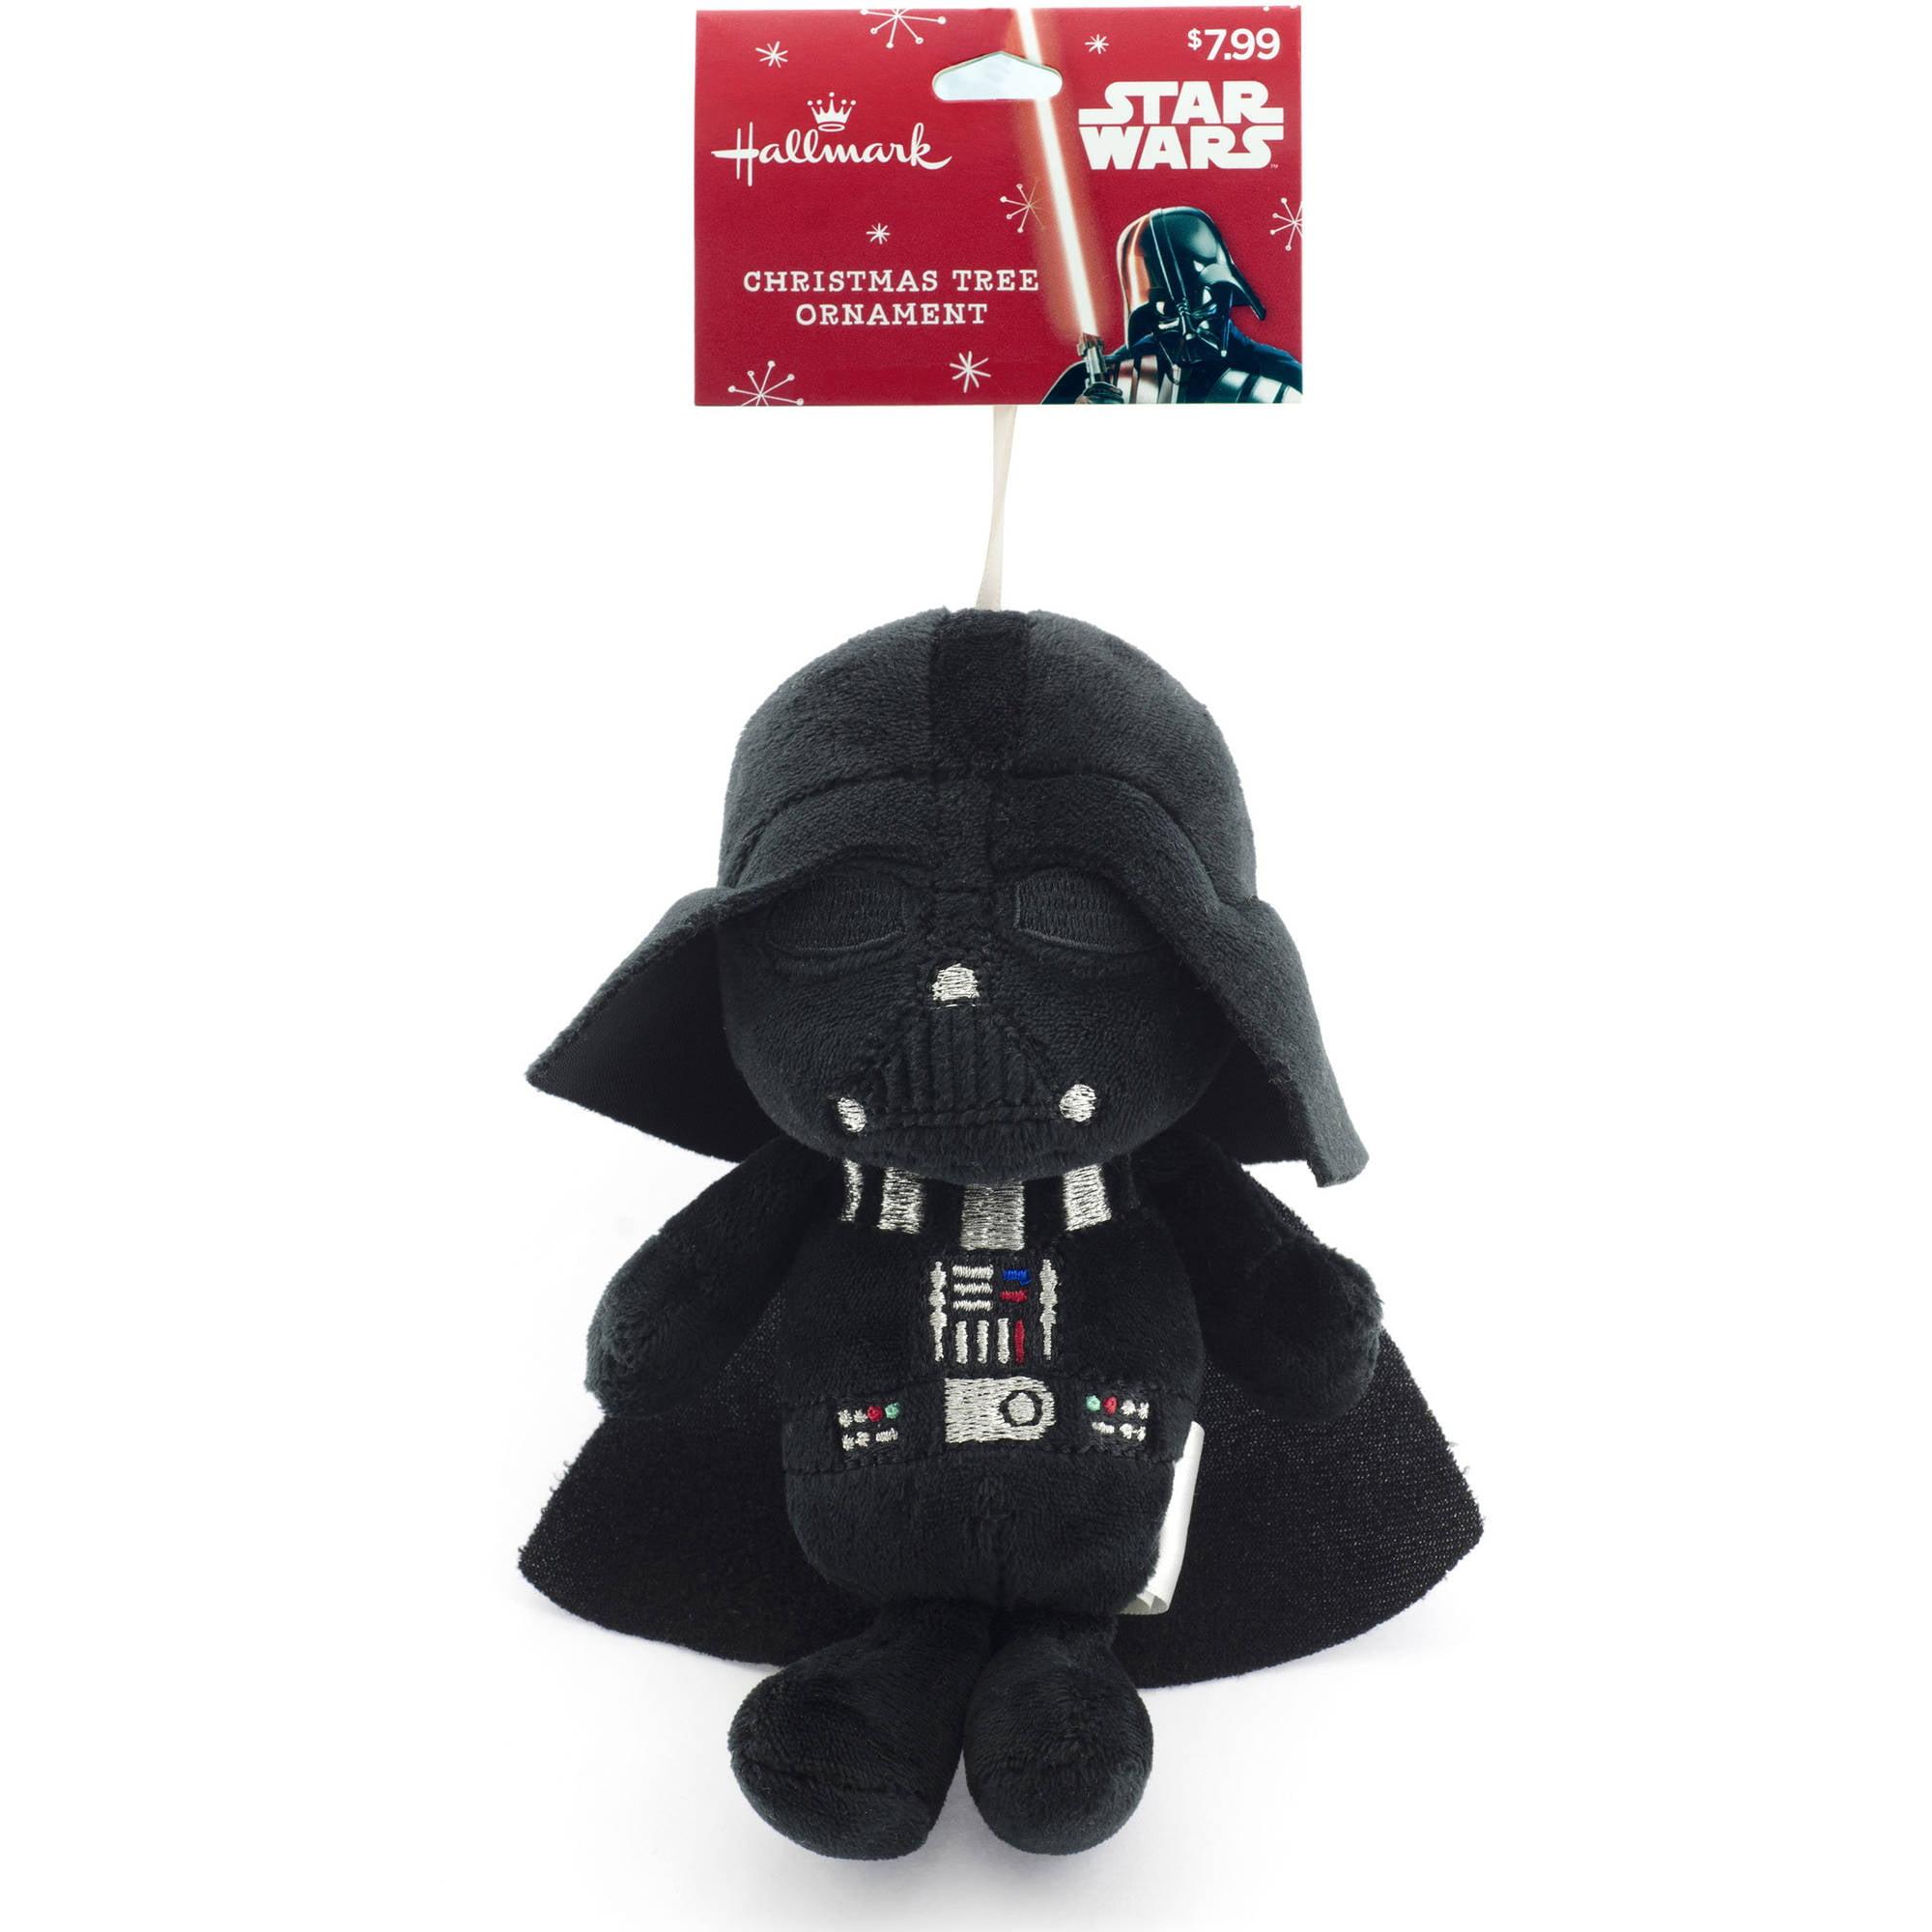 Hallmark Star Wars Darth Vader Plush Ornament - Walmart.com